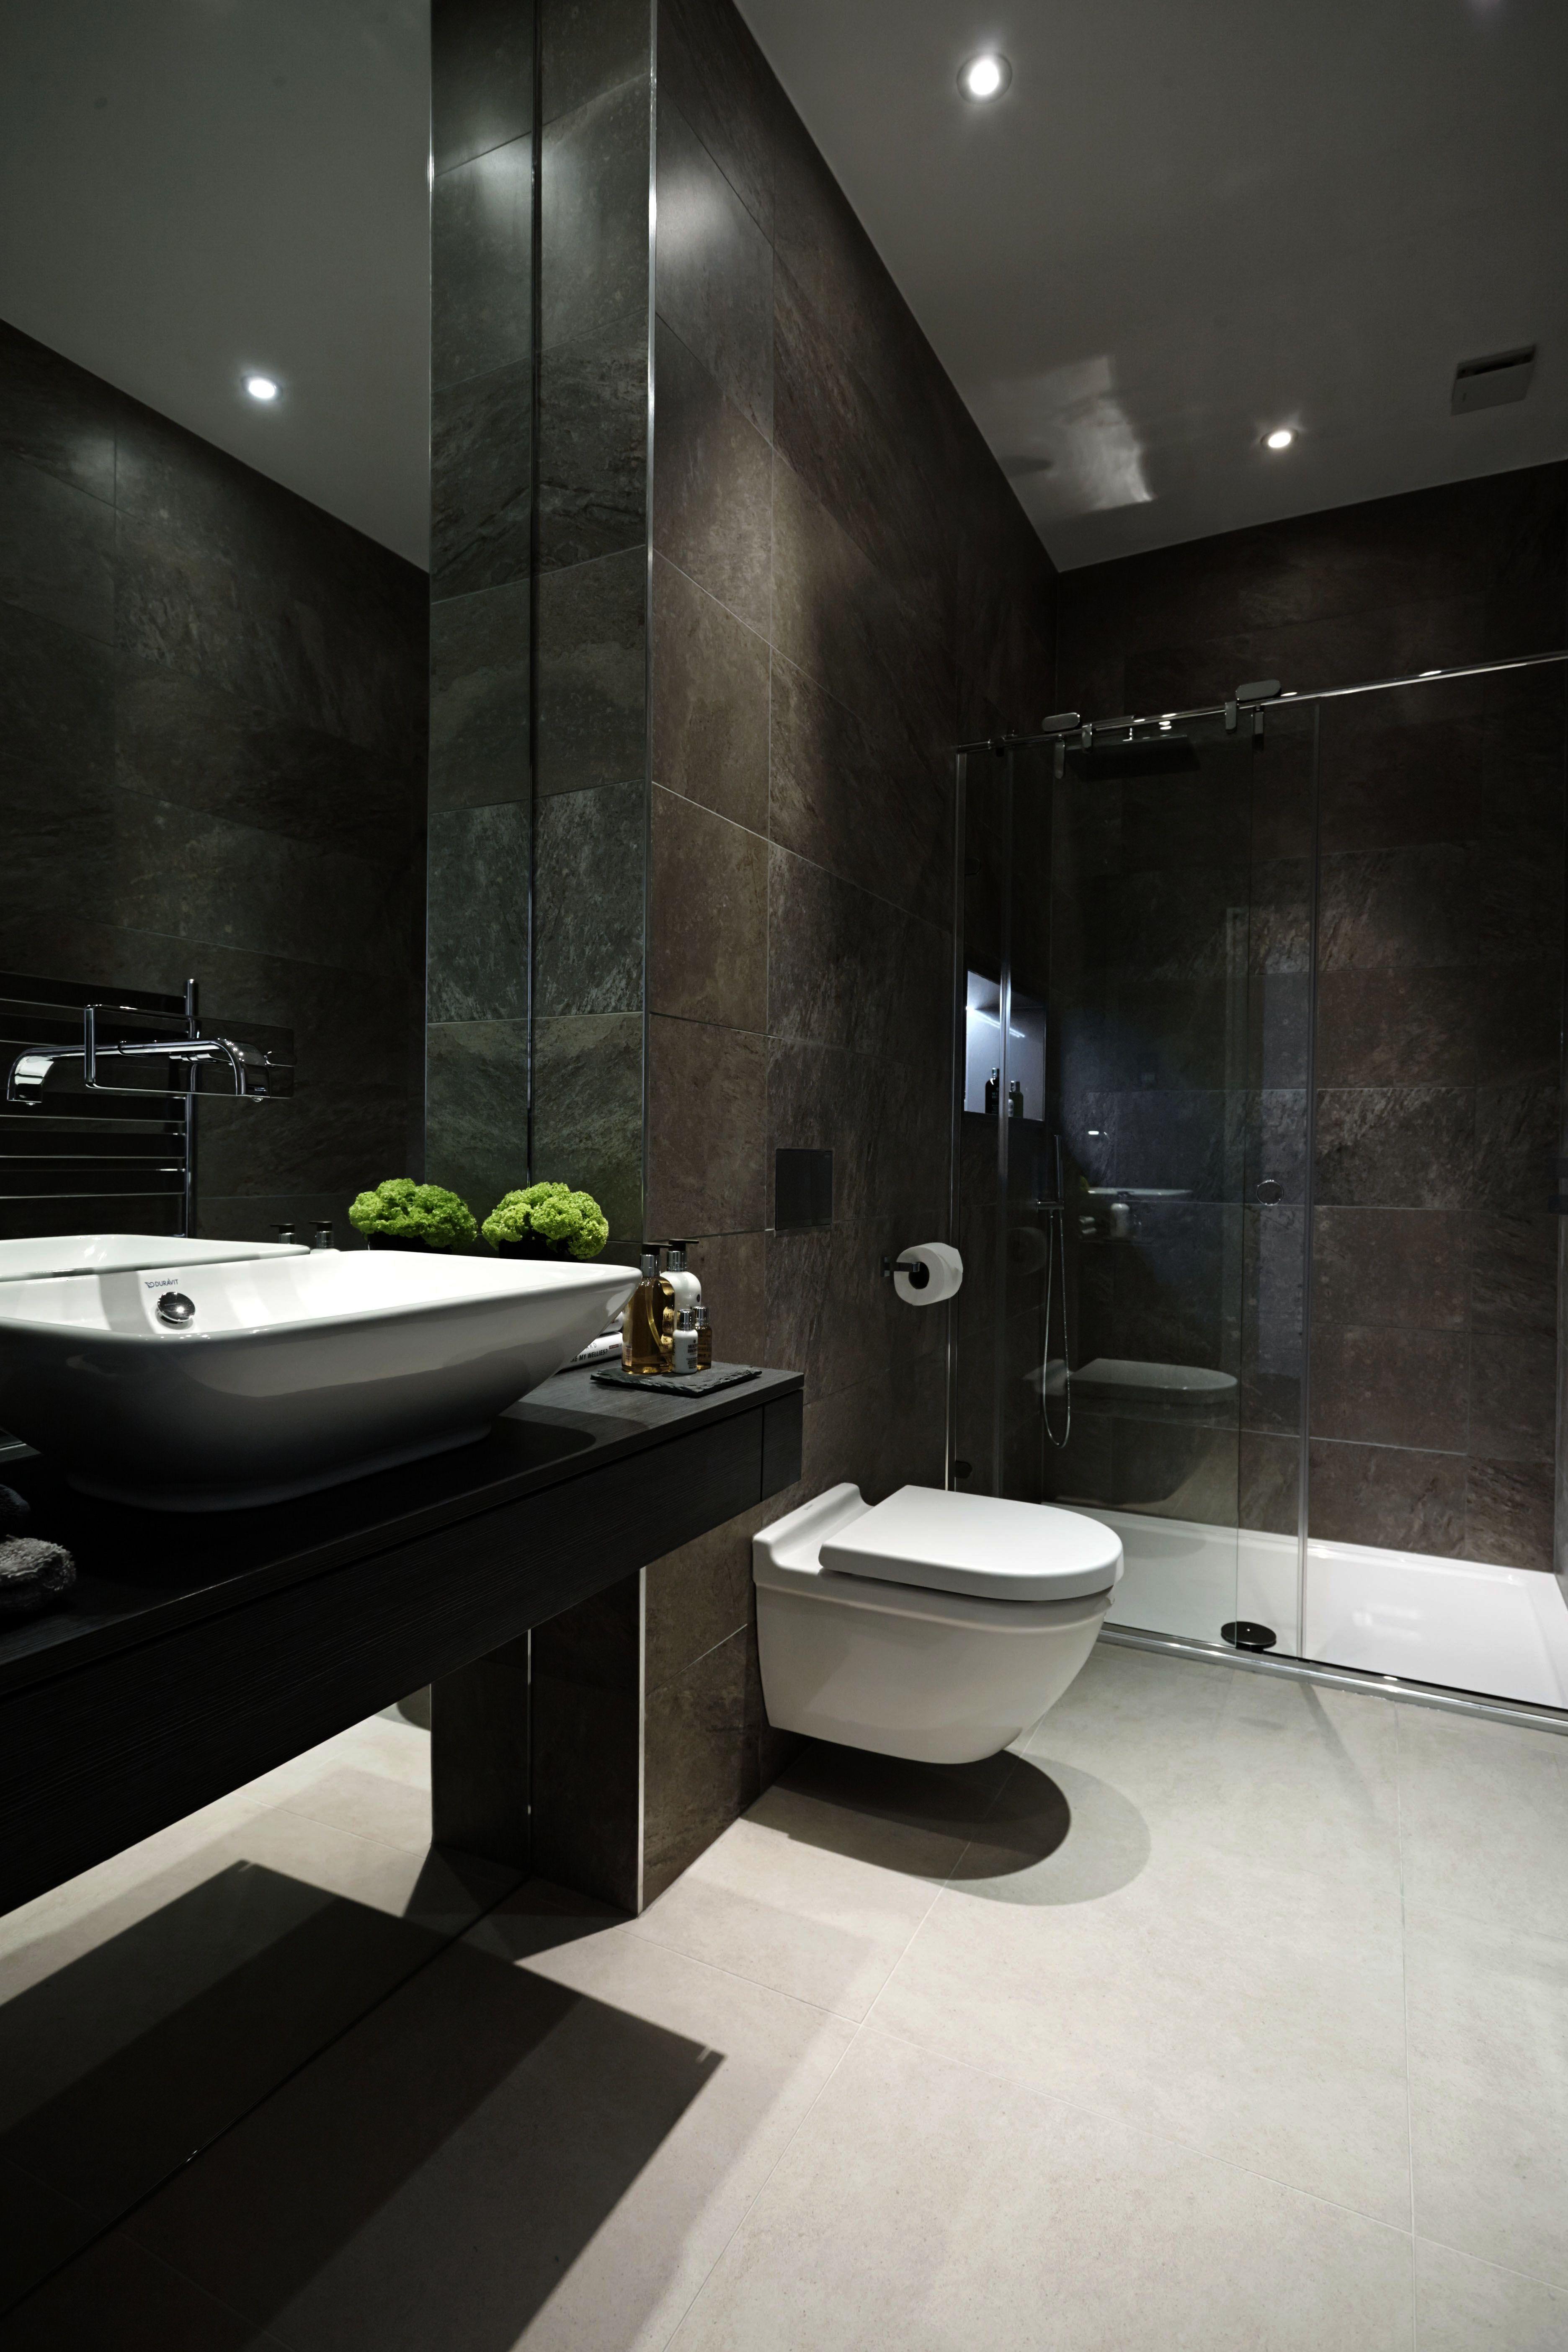 Elegant Bathroom Pinterest Luxury Bathrooms Oxfordshire Bathroom Accessories Luxury Dark Tile Bathroom Small Bathroom Remodel